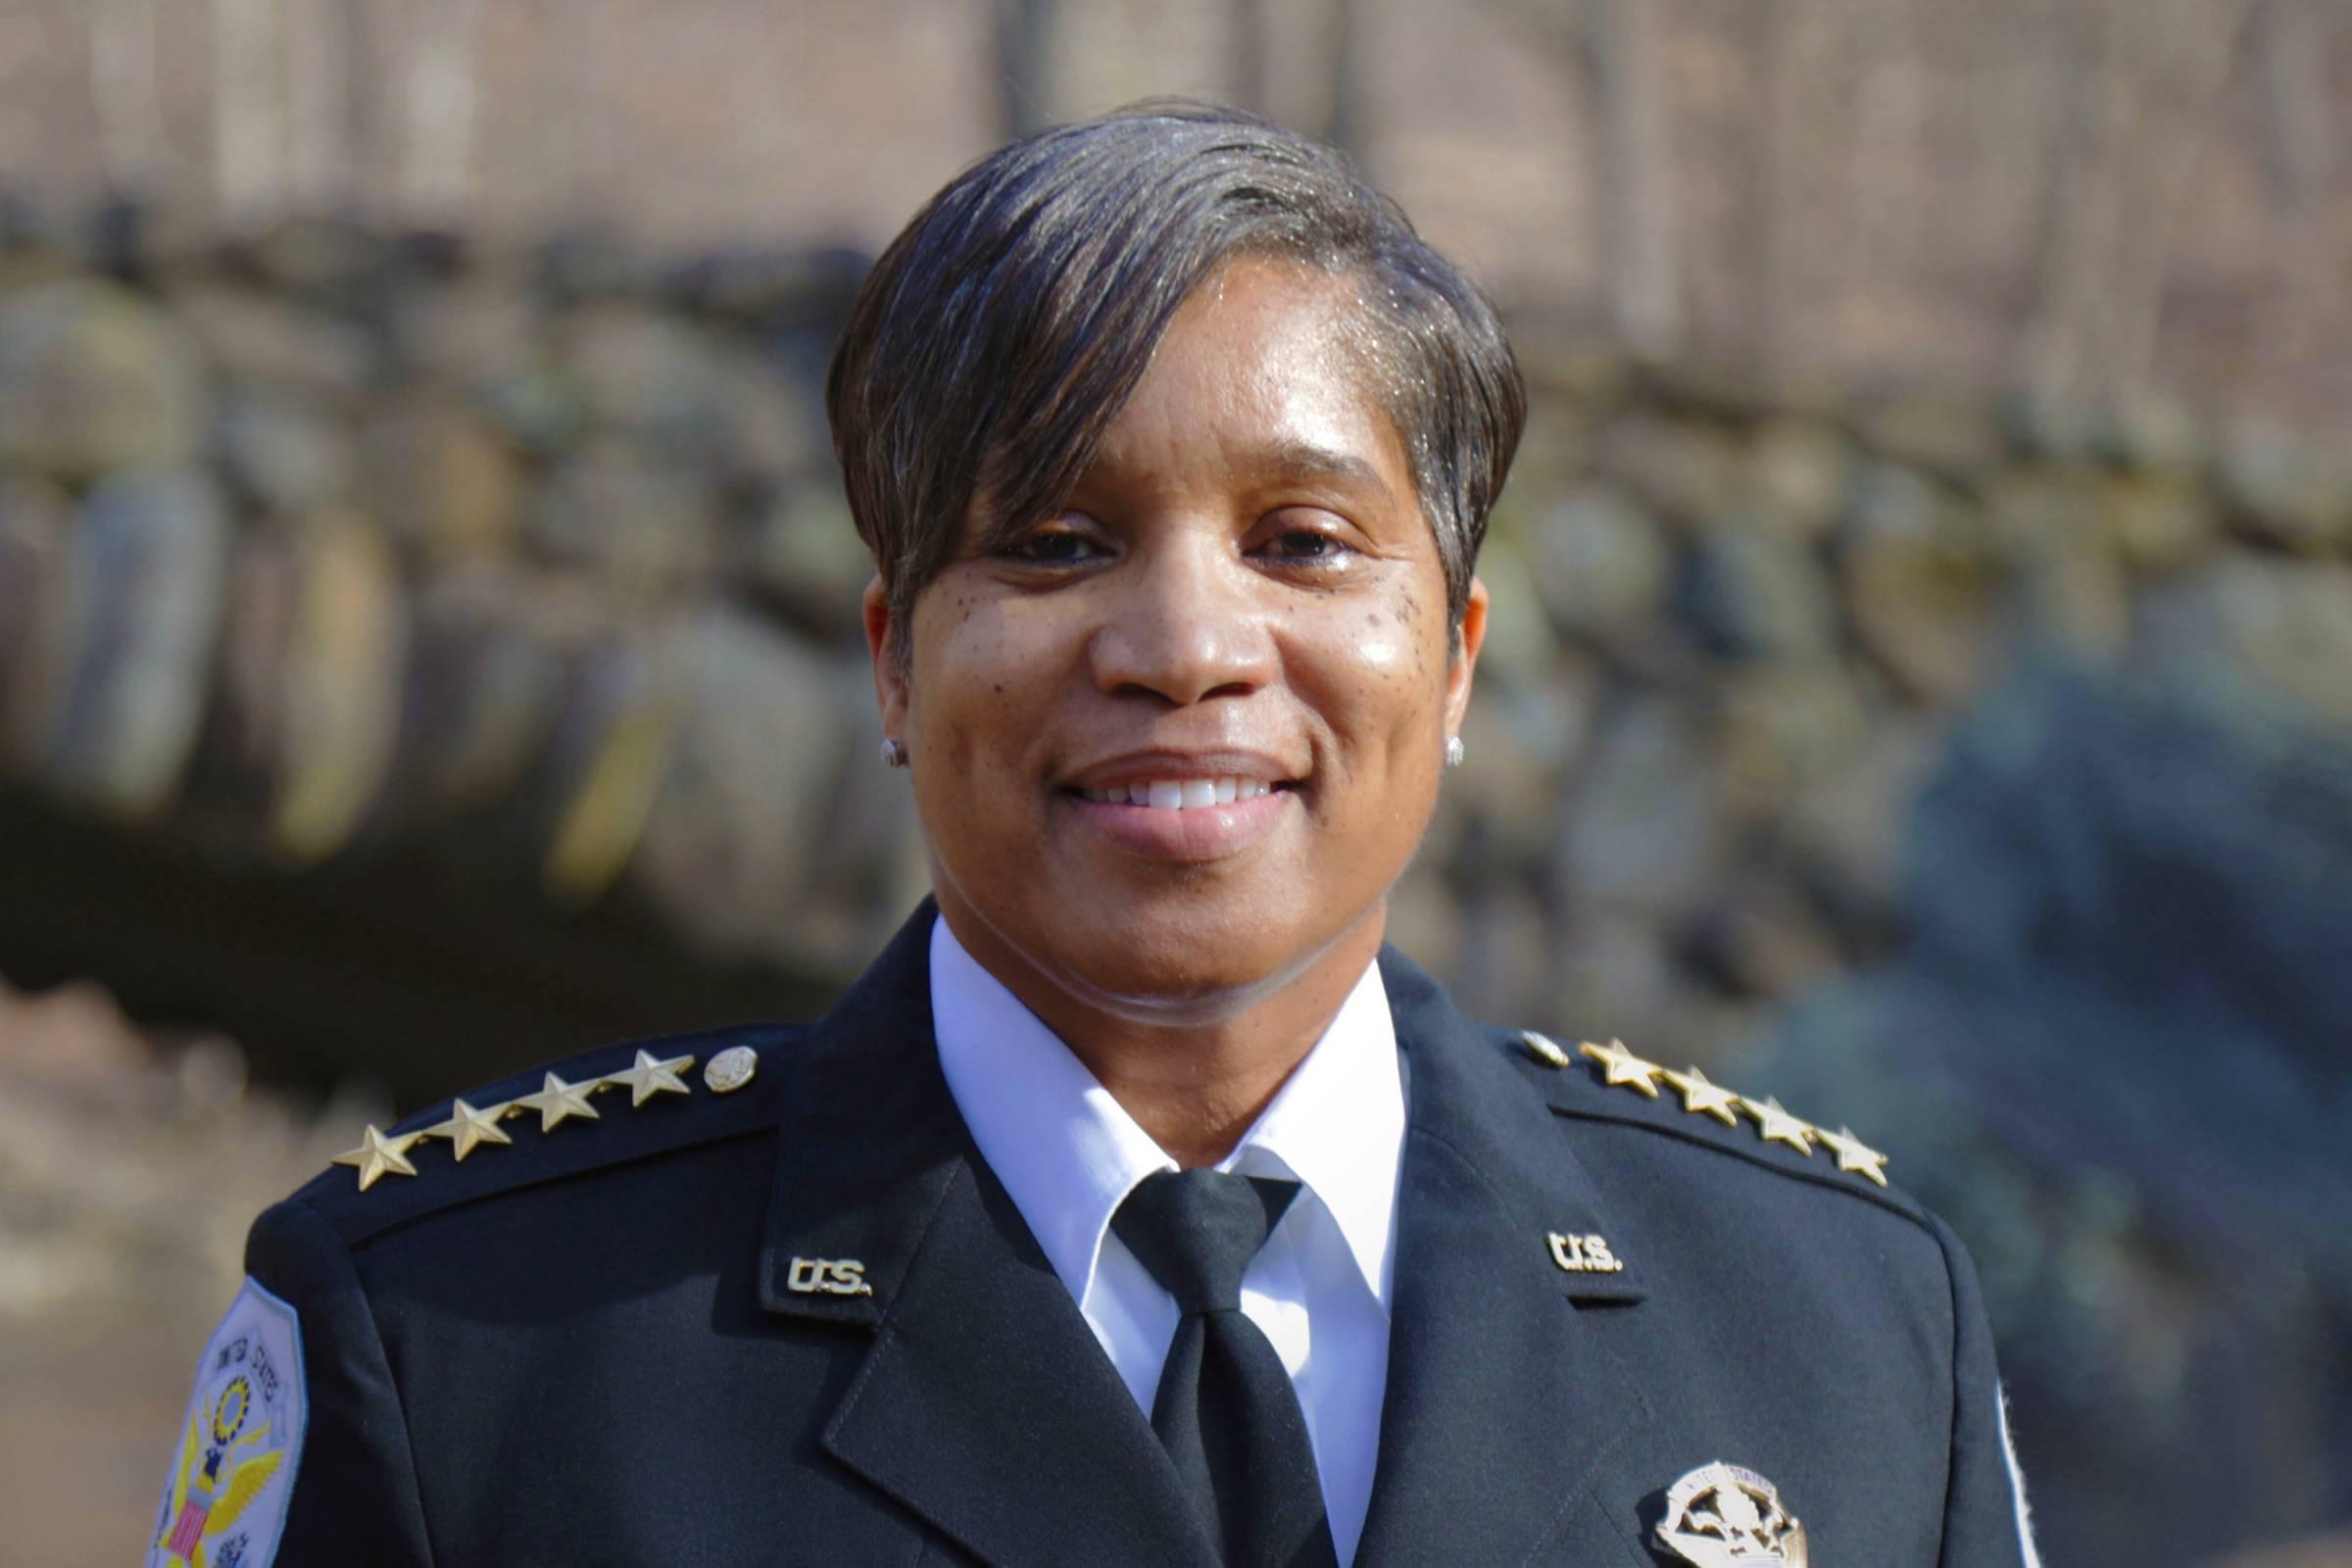 U.S. Park Police Chief Pamela A. Smith